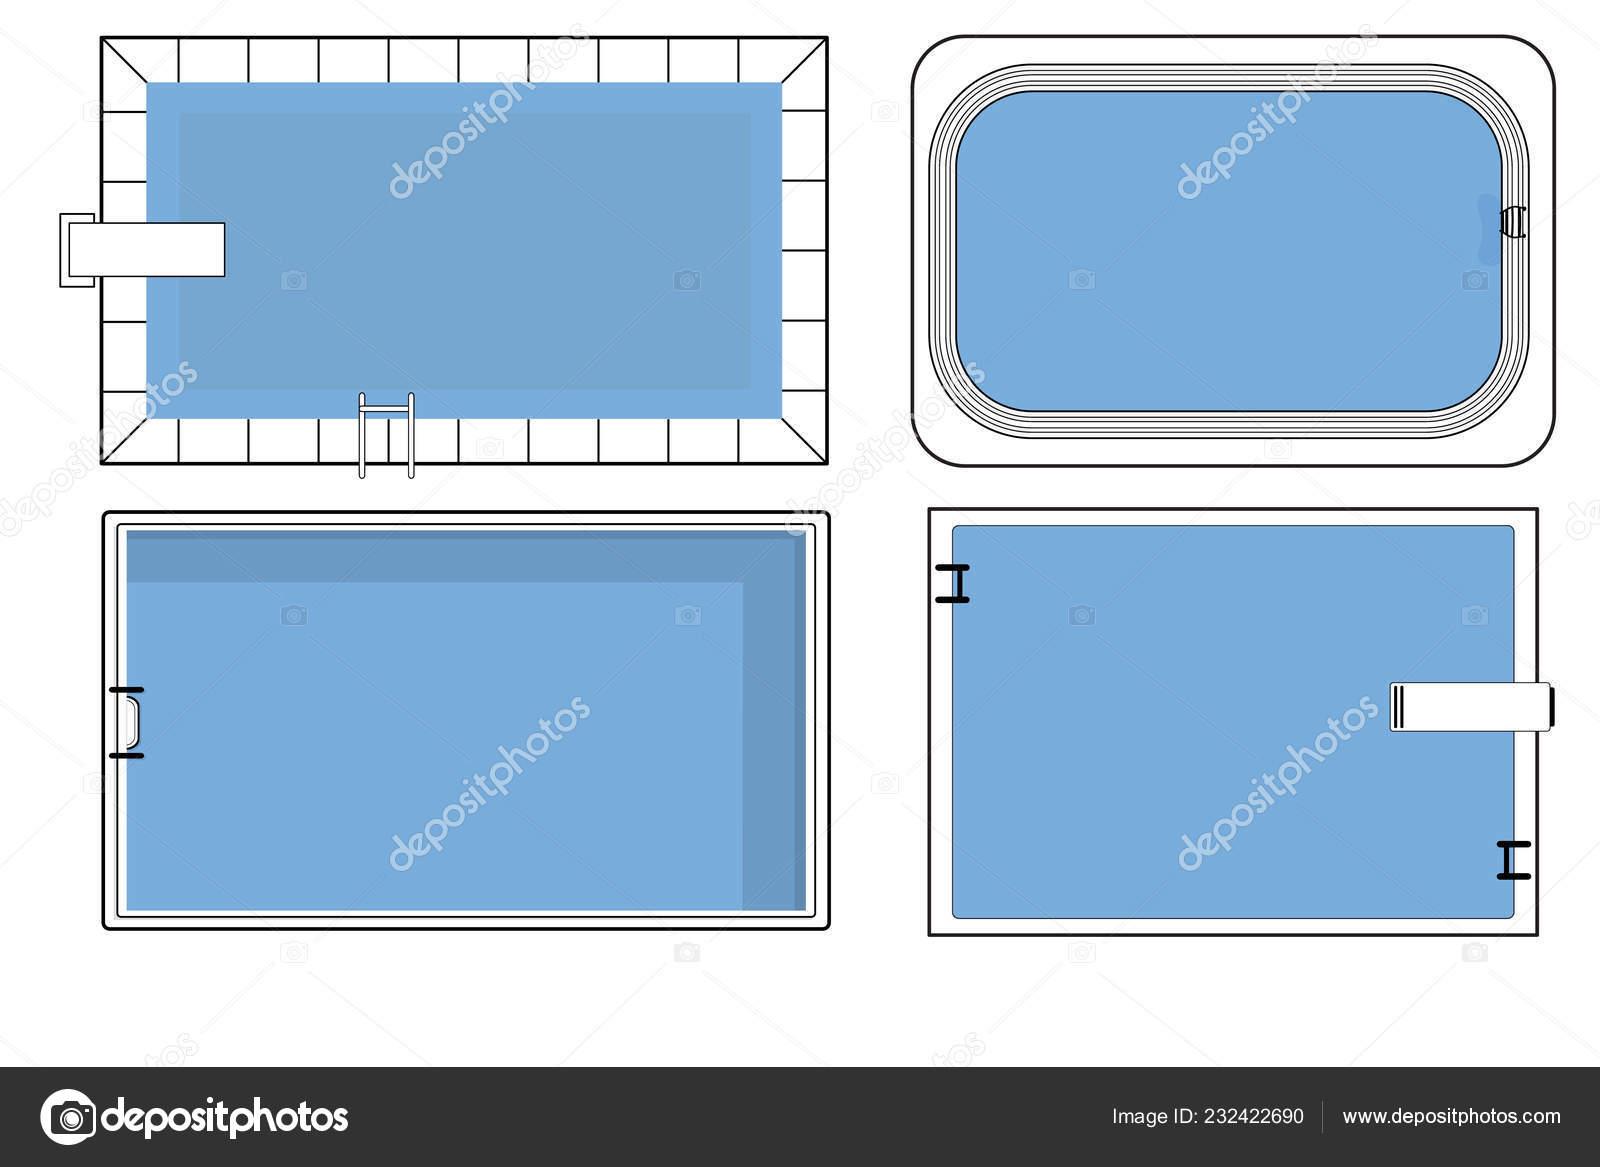 Swimming pool drawing | Set Swimming Pool Plans Top View ...